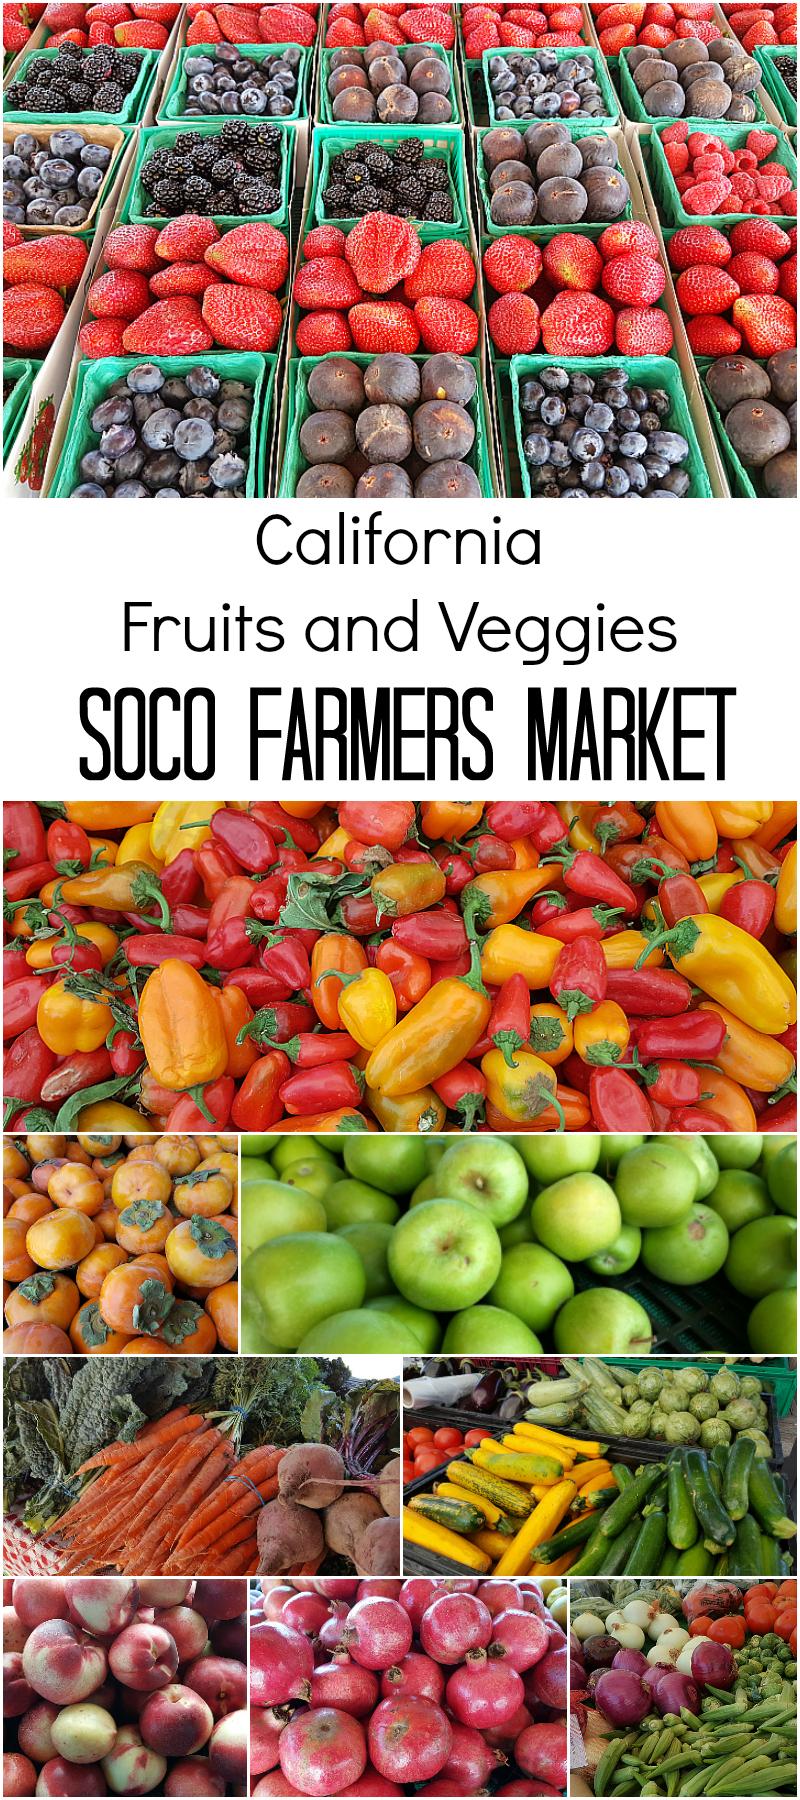 SoCo Farmers Market - Costa Mesa, California